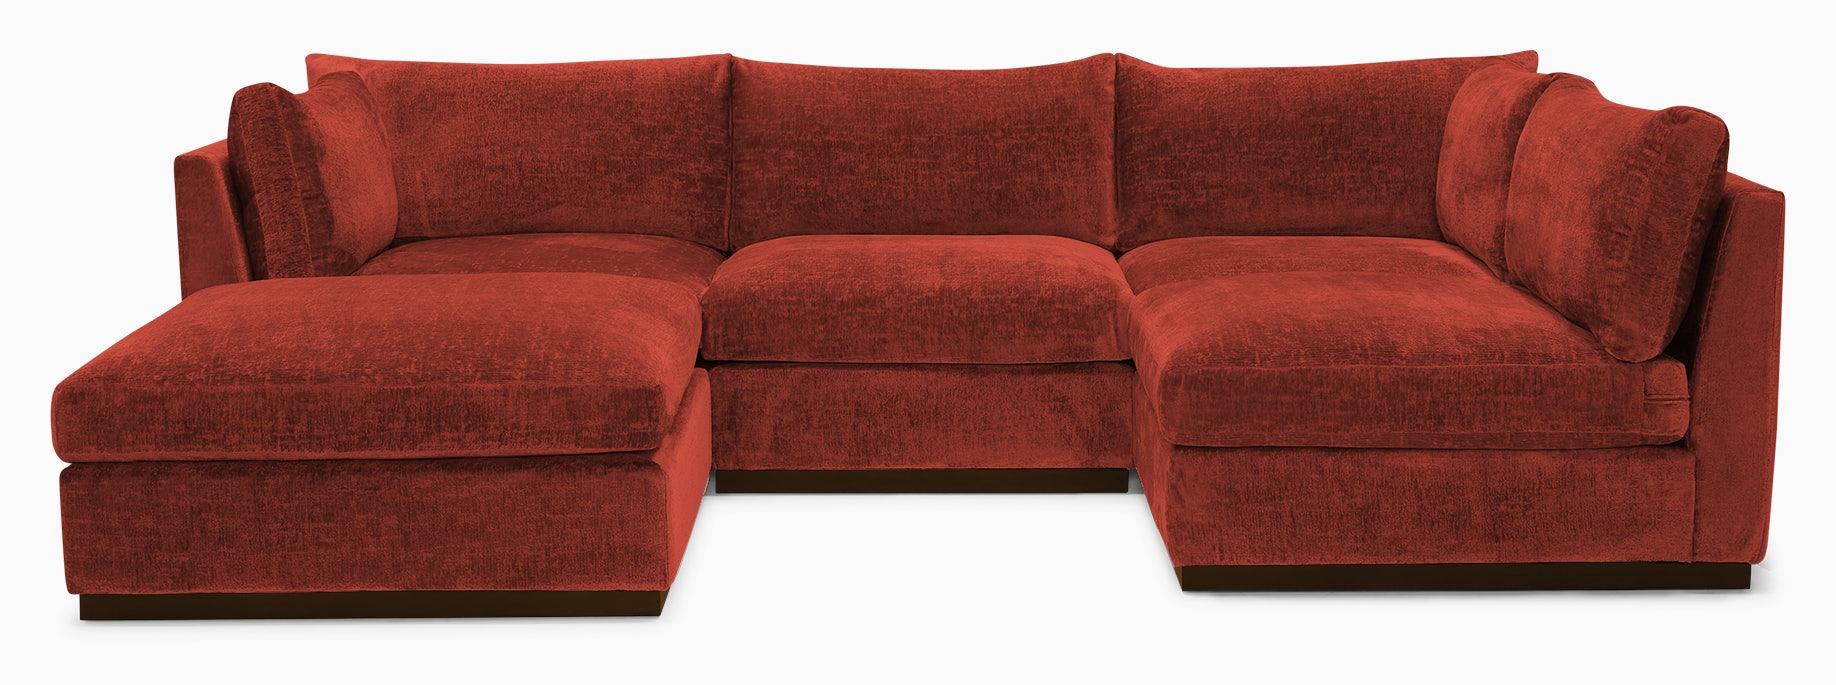 holt armless sofa sectional %285 piece%29 cordova picante